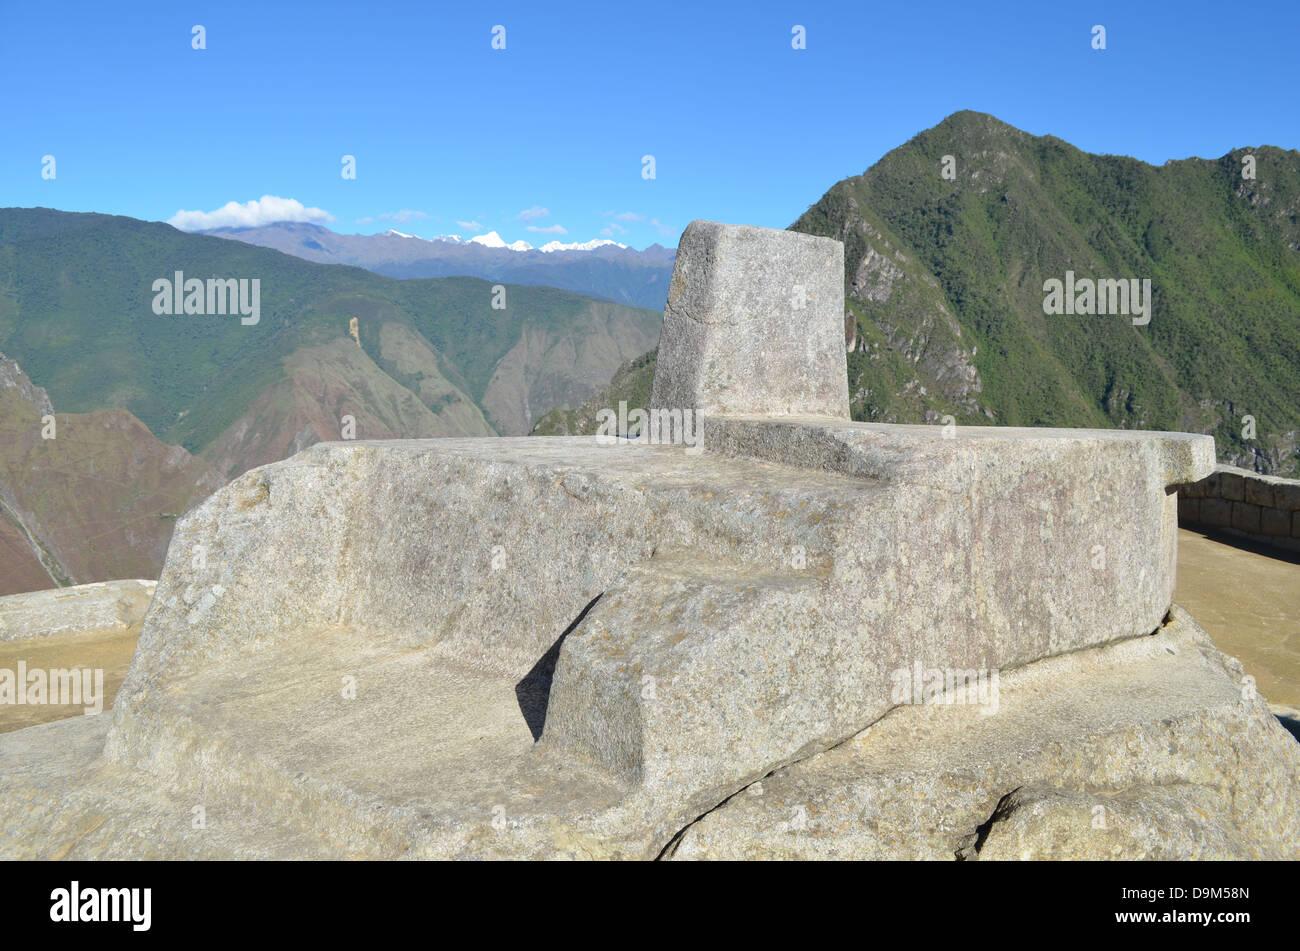 Mountain living near cusco peru royalty free stock photo - Stock Photo The Inti Watana A Sacred Ritual Stone At Machu Picchu Near Cusco Peru